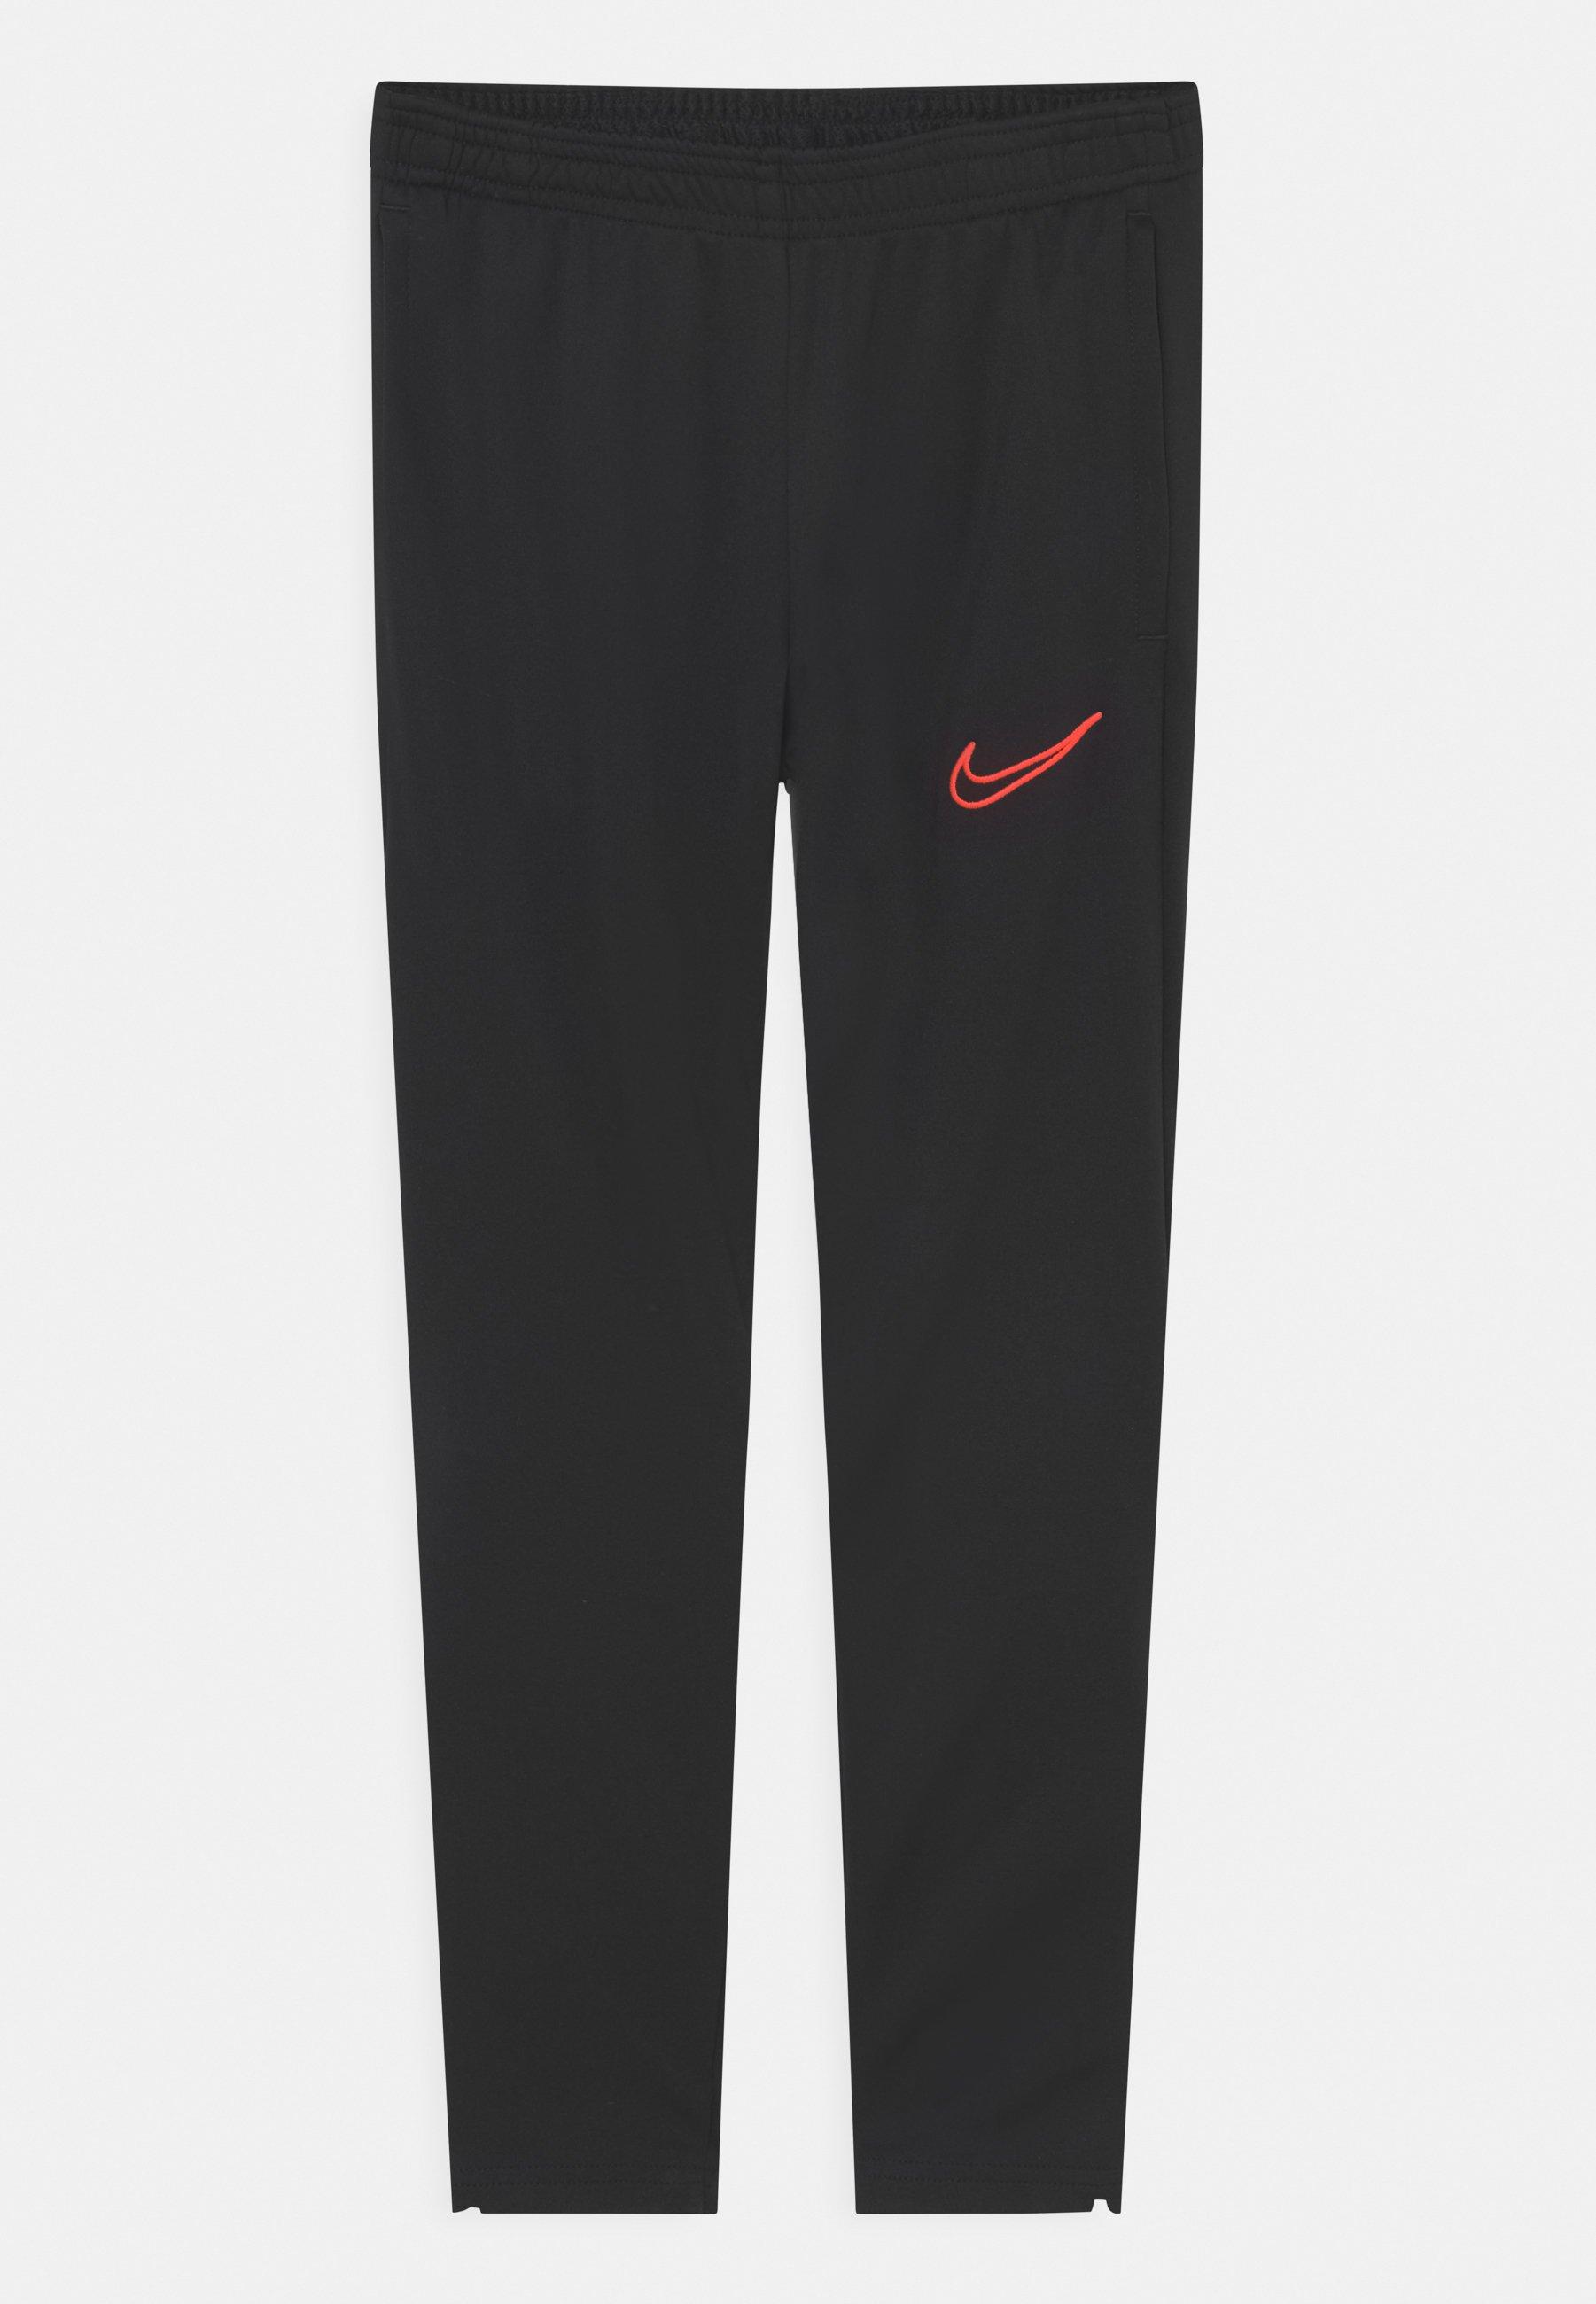 Zwarte kinder voetbalbroek Nike Dri-Fit Academy - CW6124-016